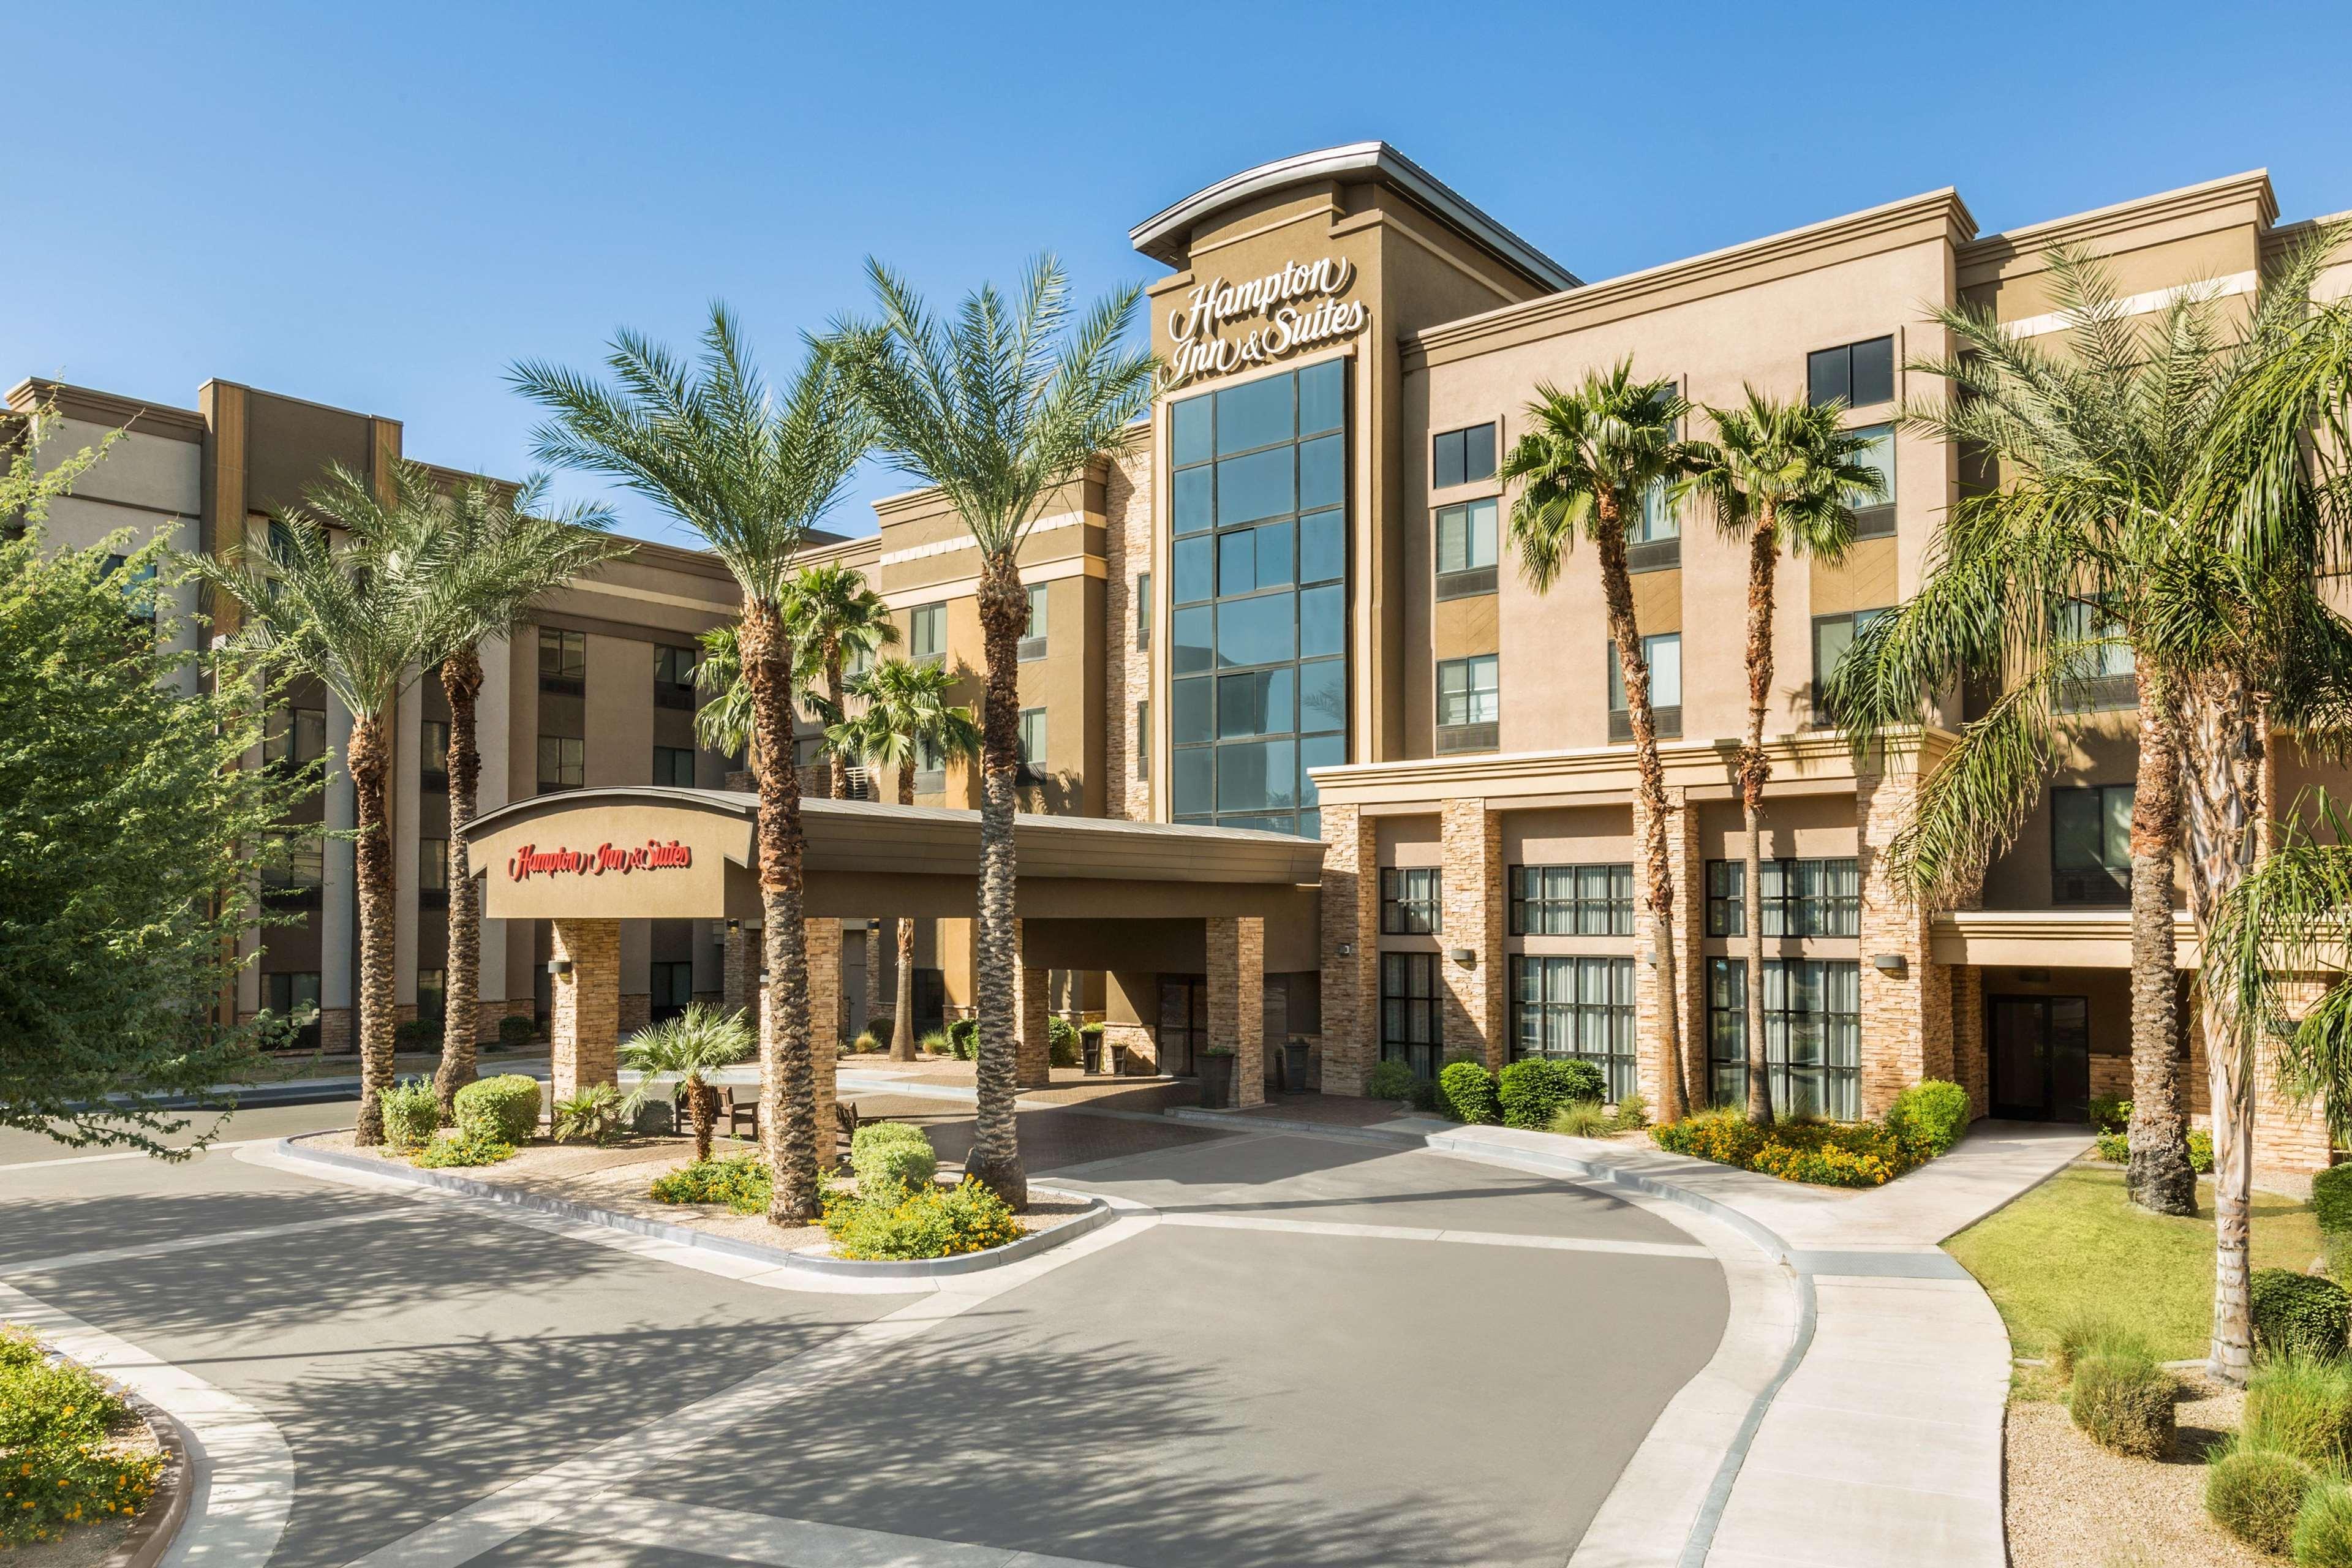 Hampton Inn & Suites Phoenix Glendale-Westgate image 32